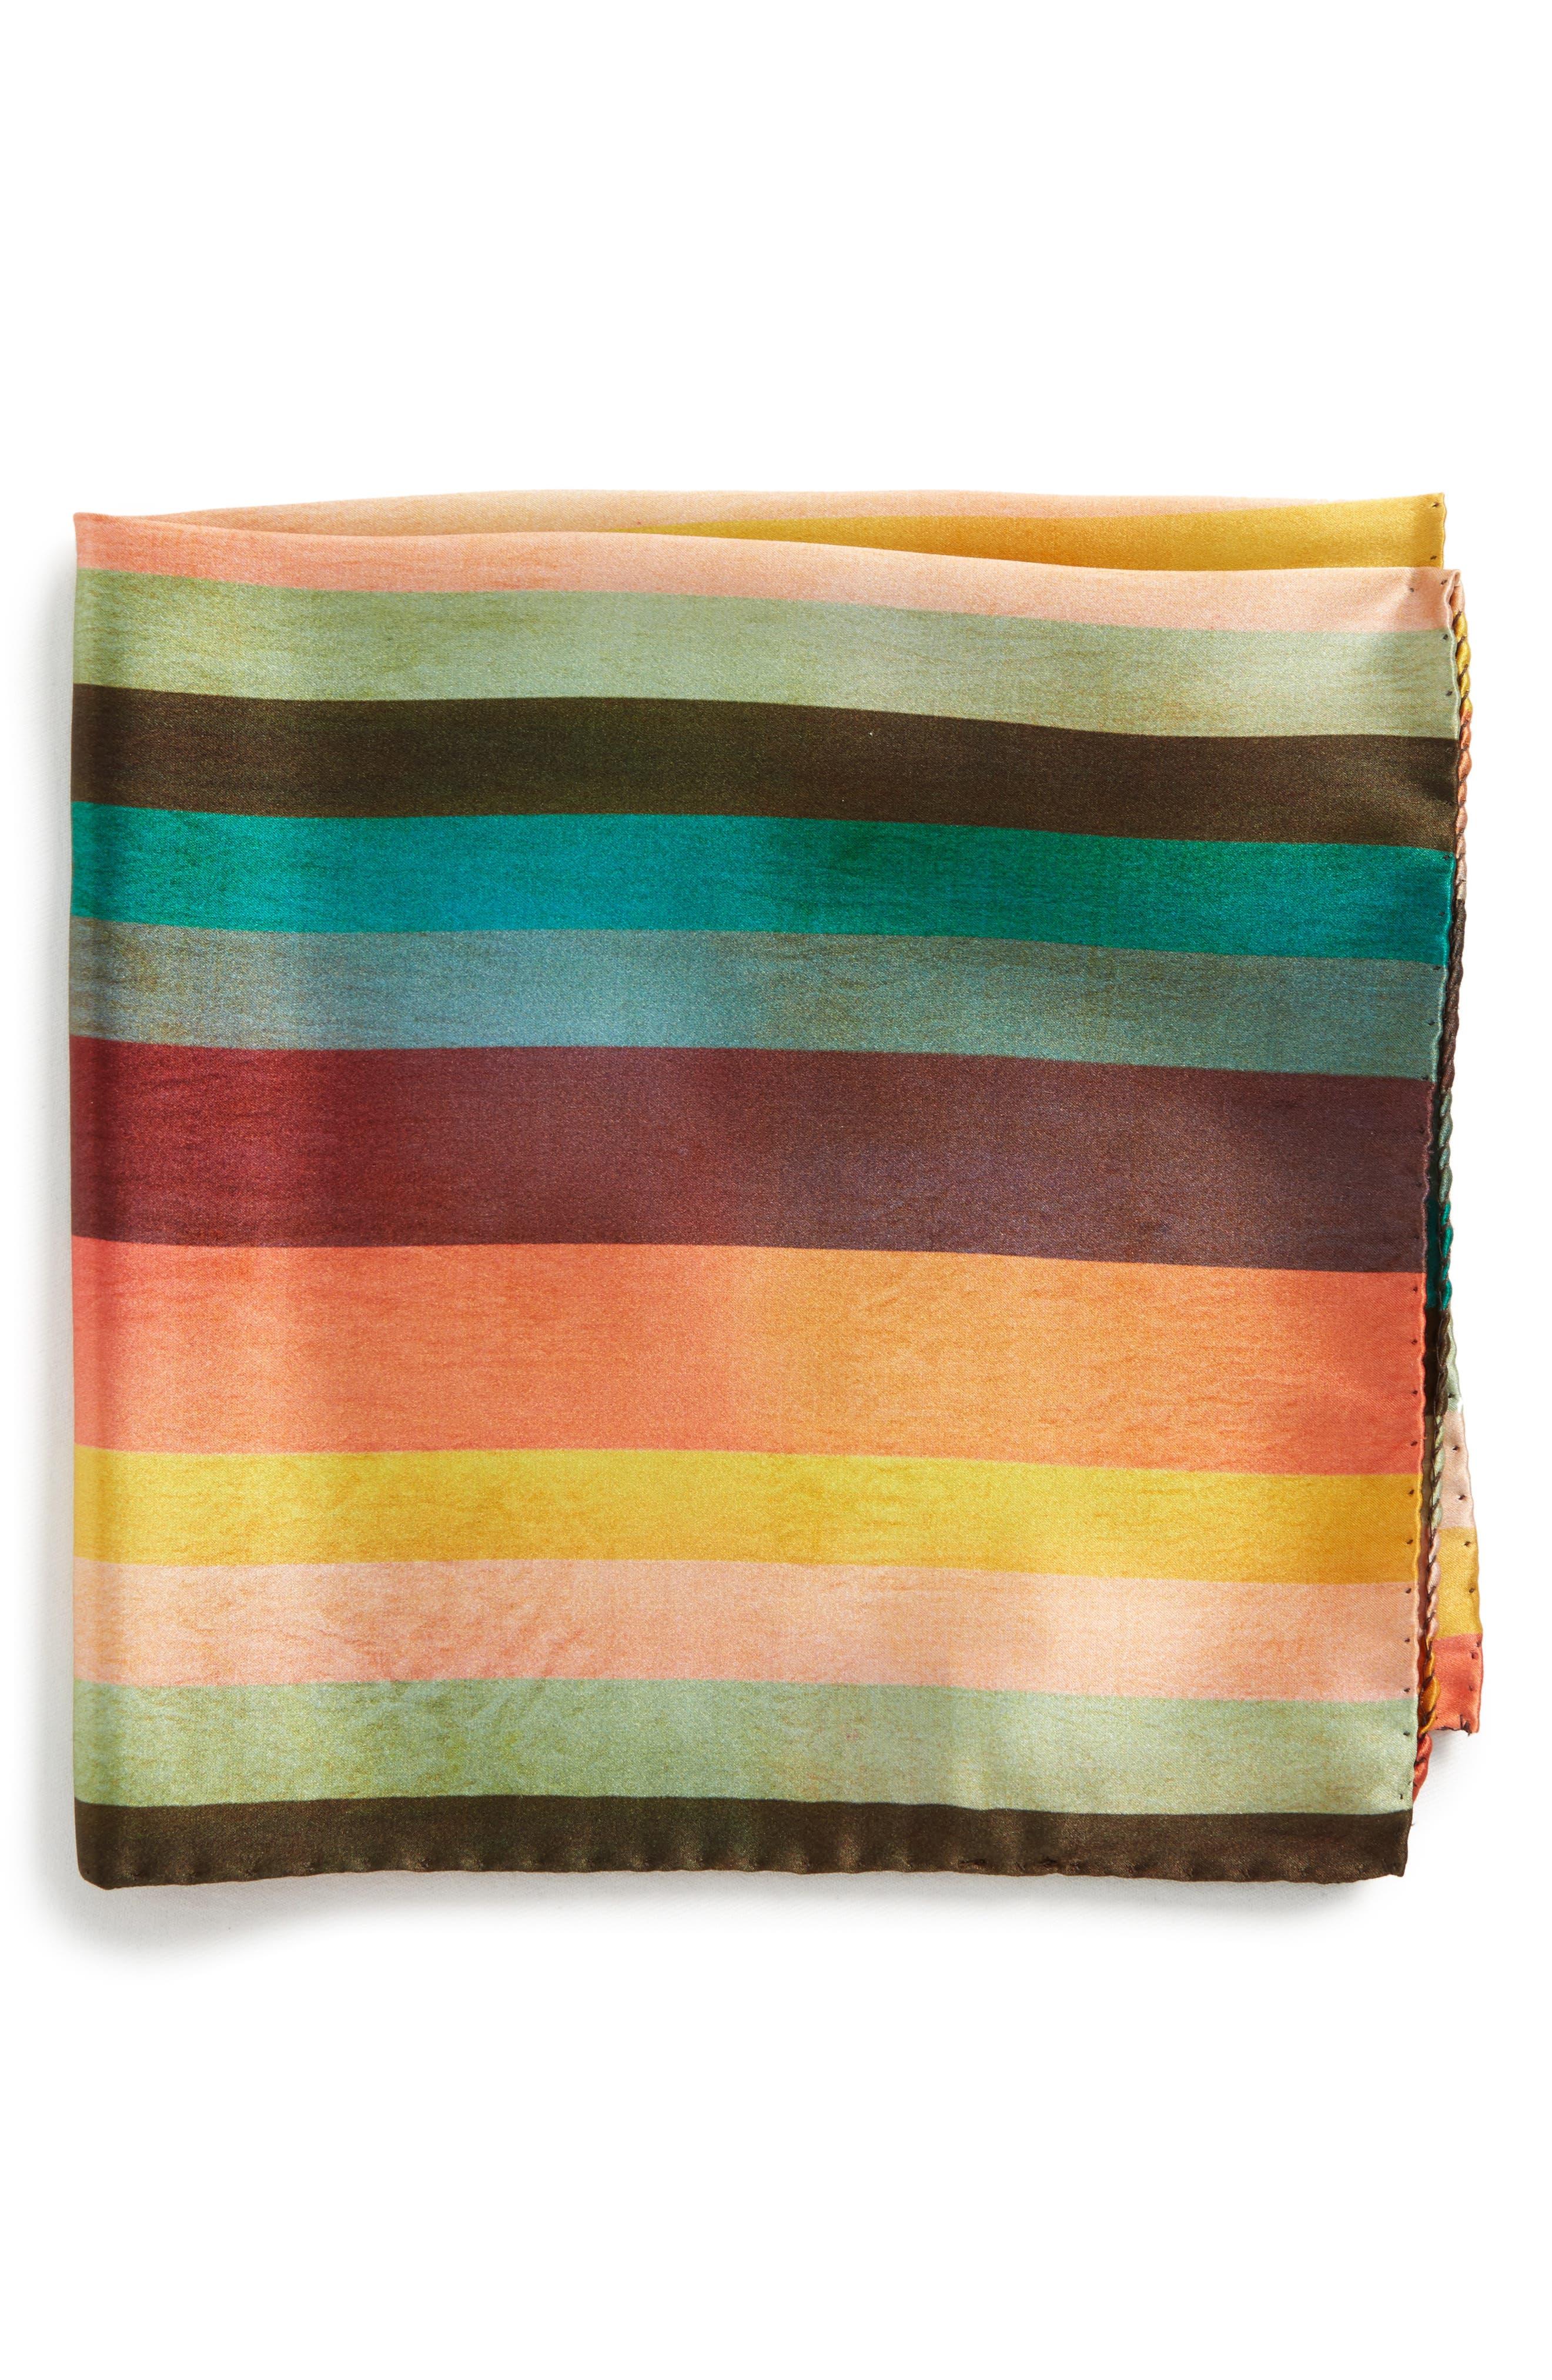 Paul Smith Artist Stripe Silk Pocket Square